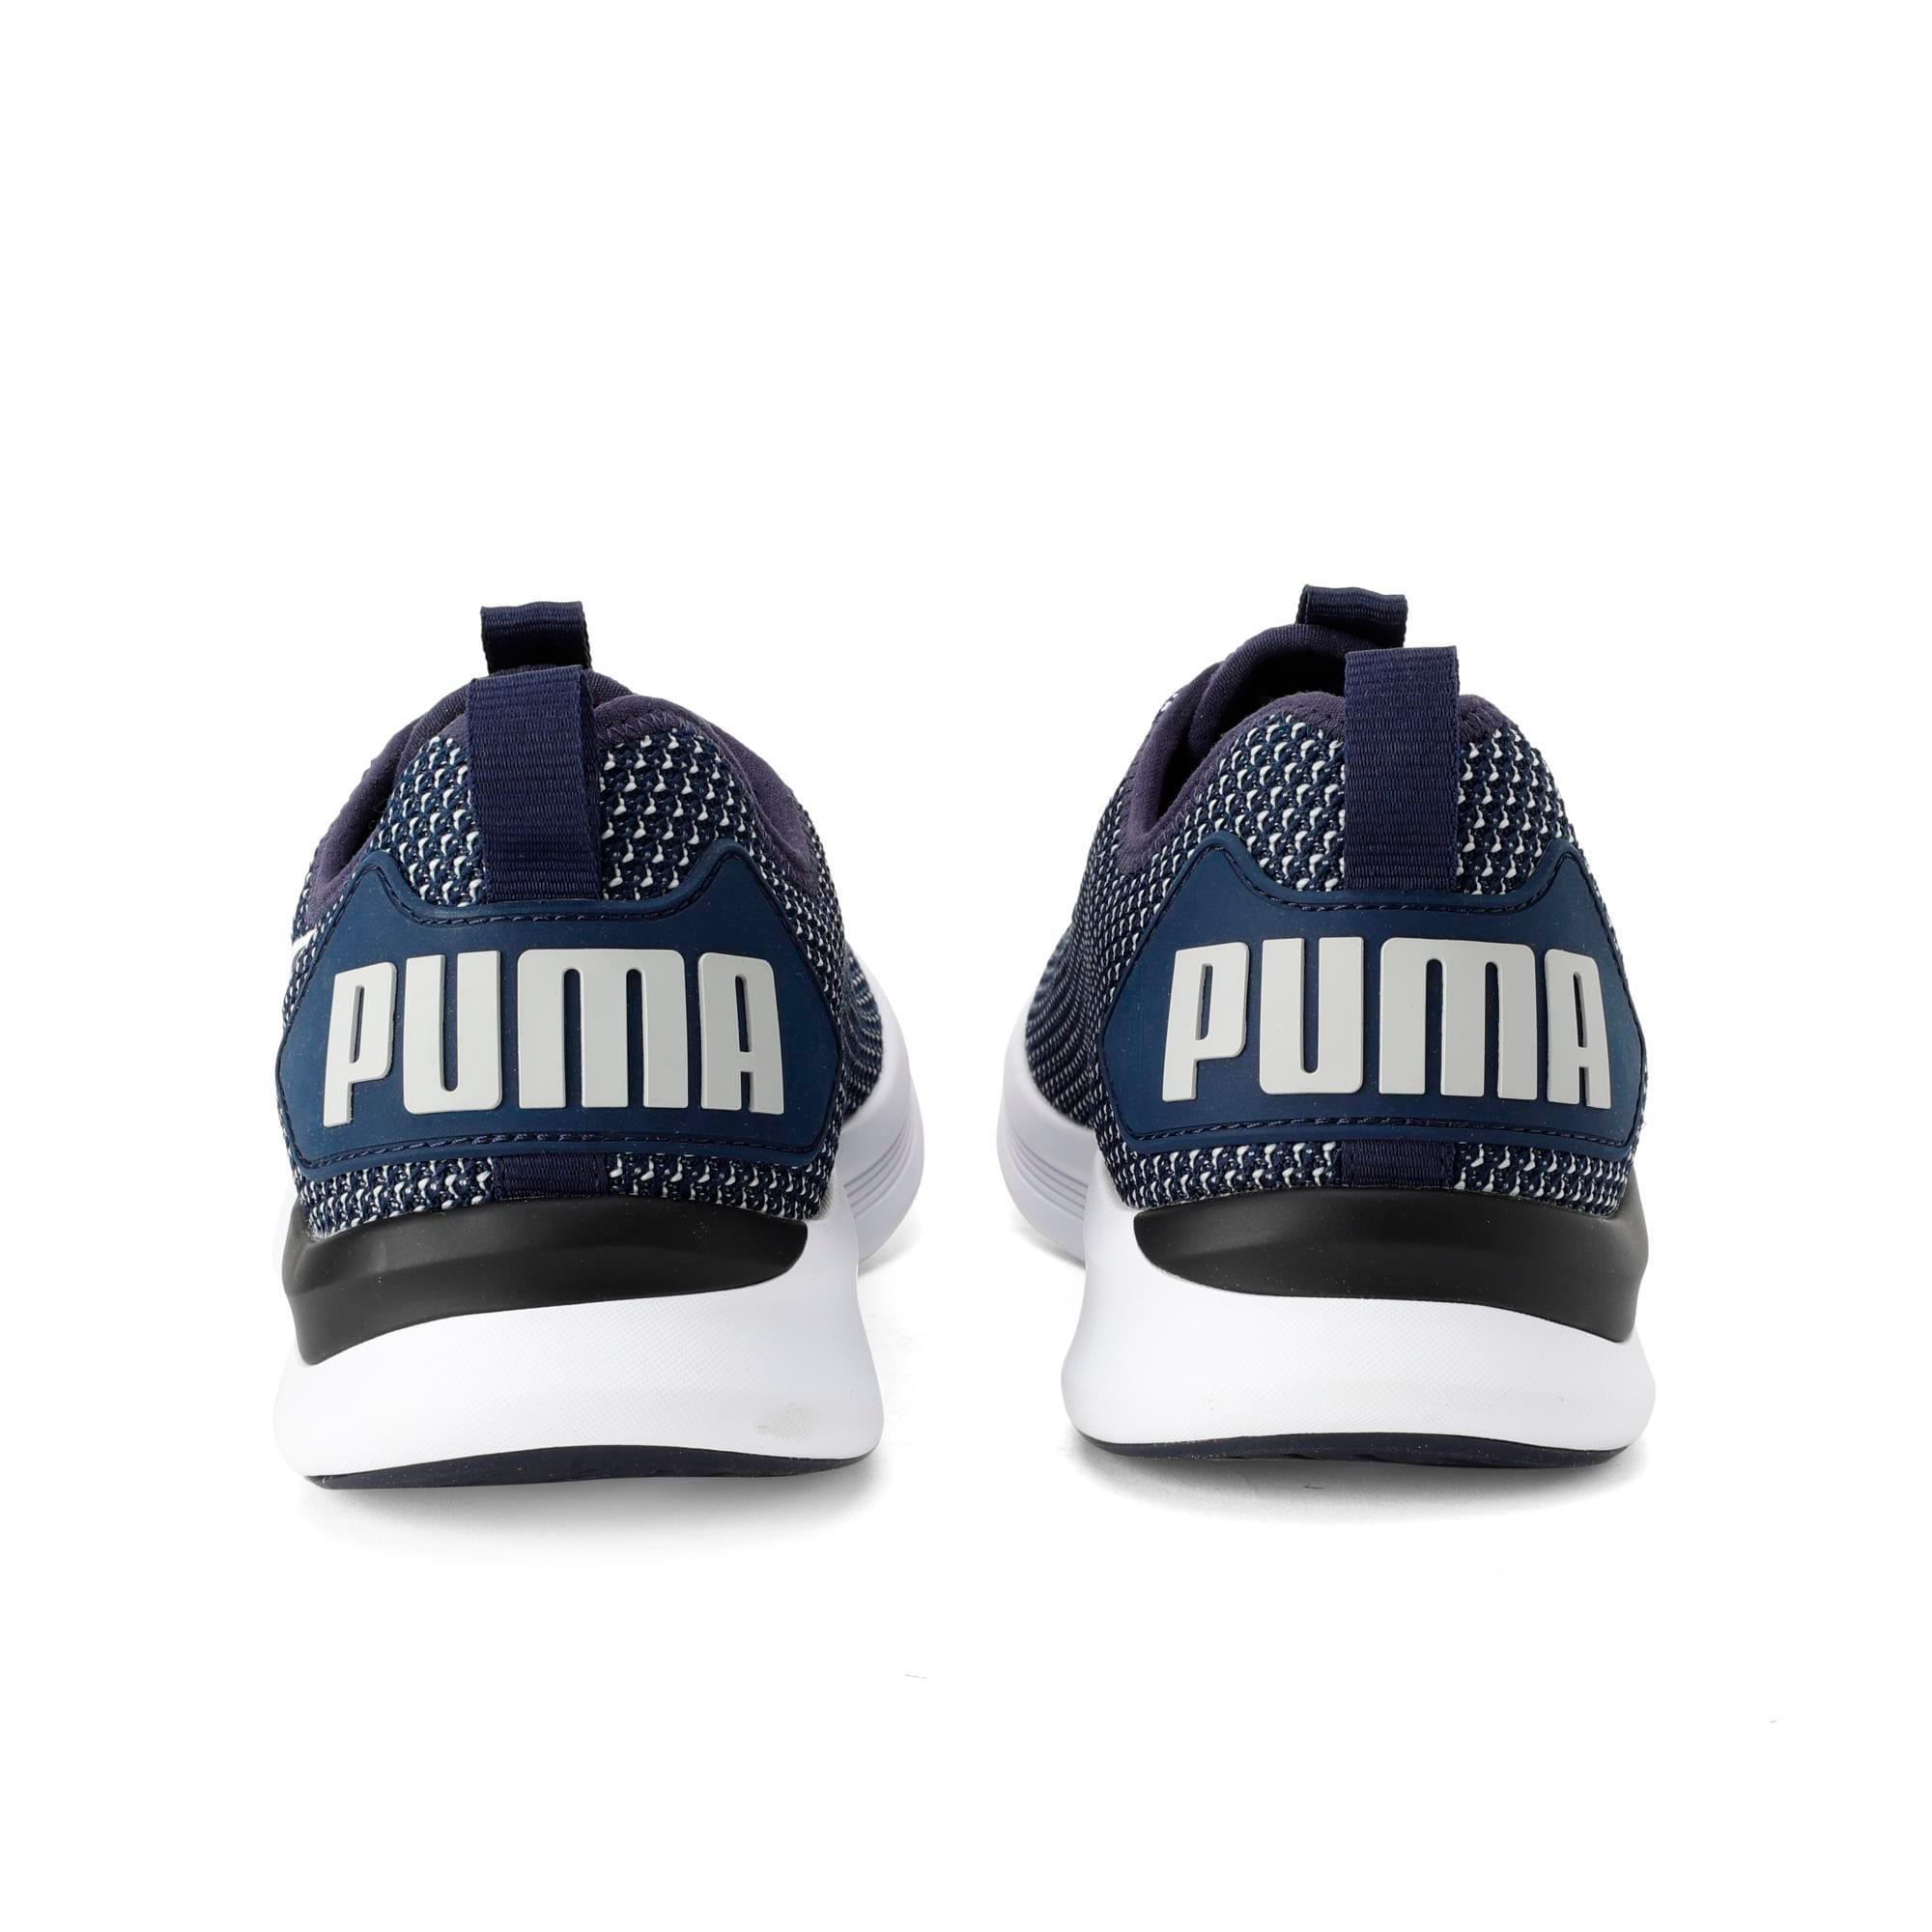 Thumbnail 3 of IGNITE Flash FS Men's Running Shoes, Peacoat-Glacier Gray-White, medium-IND